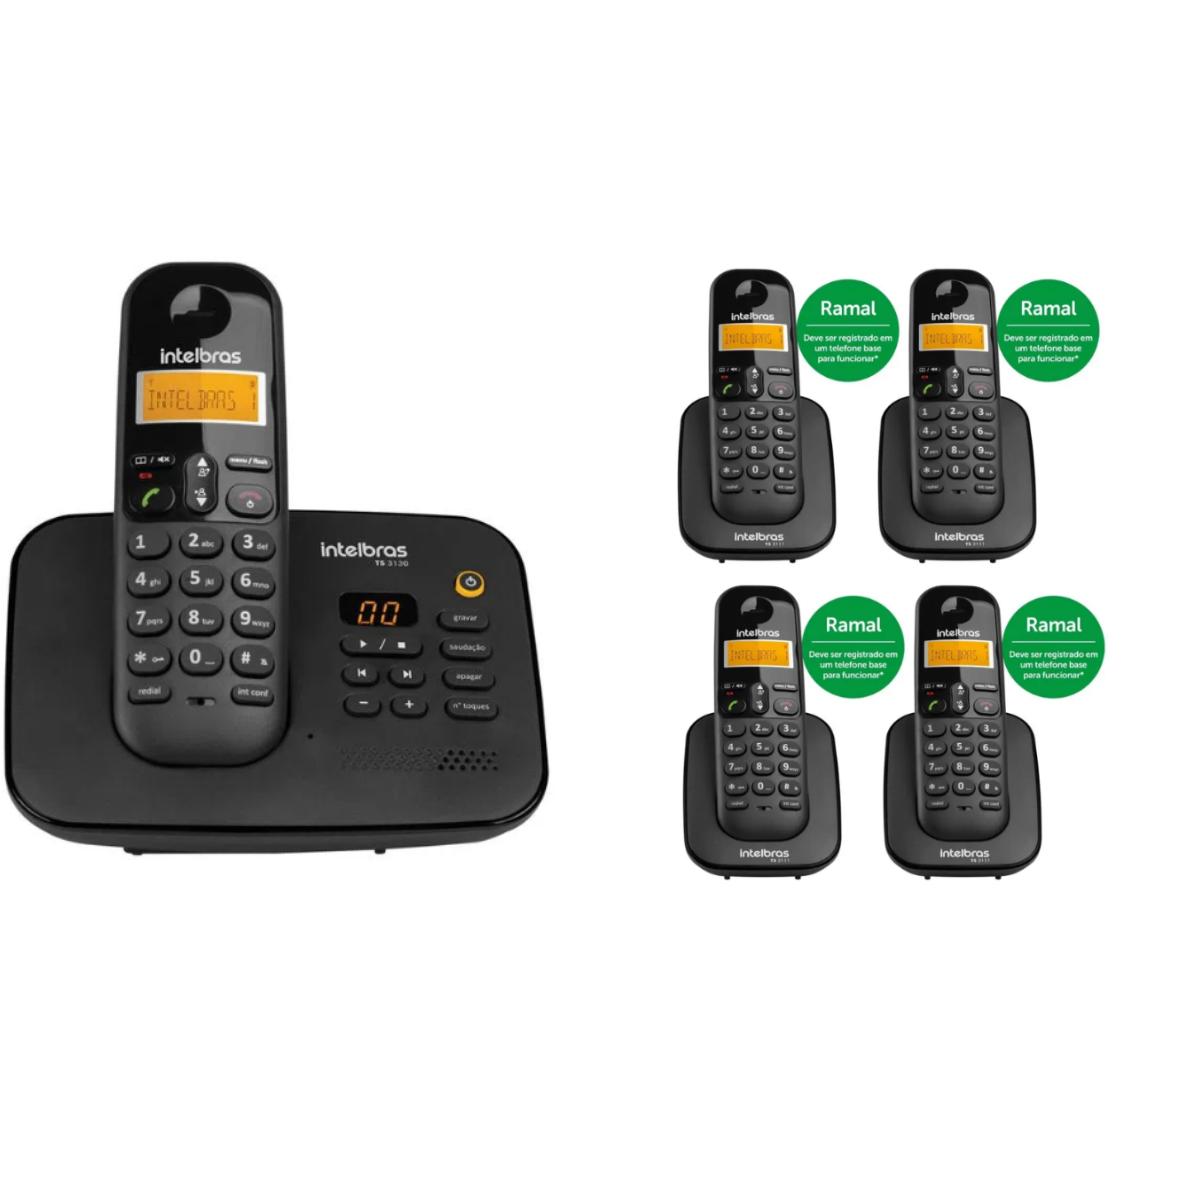 KIT TELEFONE INTELBRAS SEM FIO TS 3130 + 04 RAMAL TS 3111 PRETO